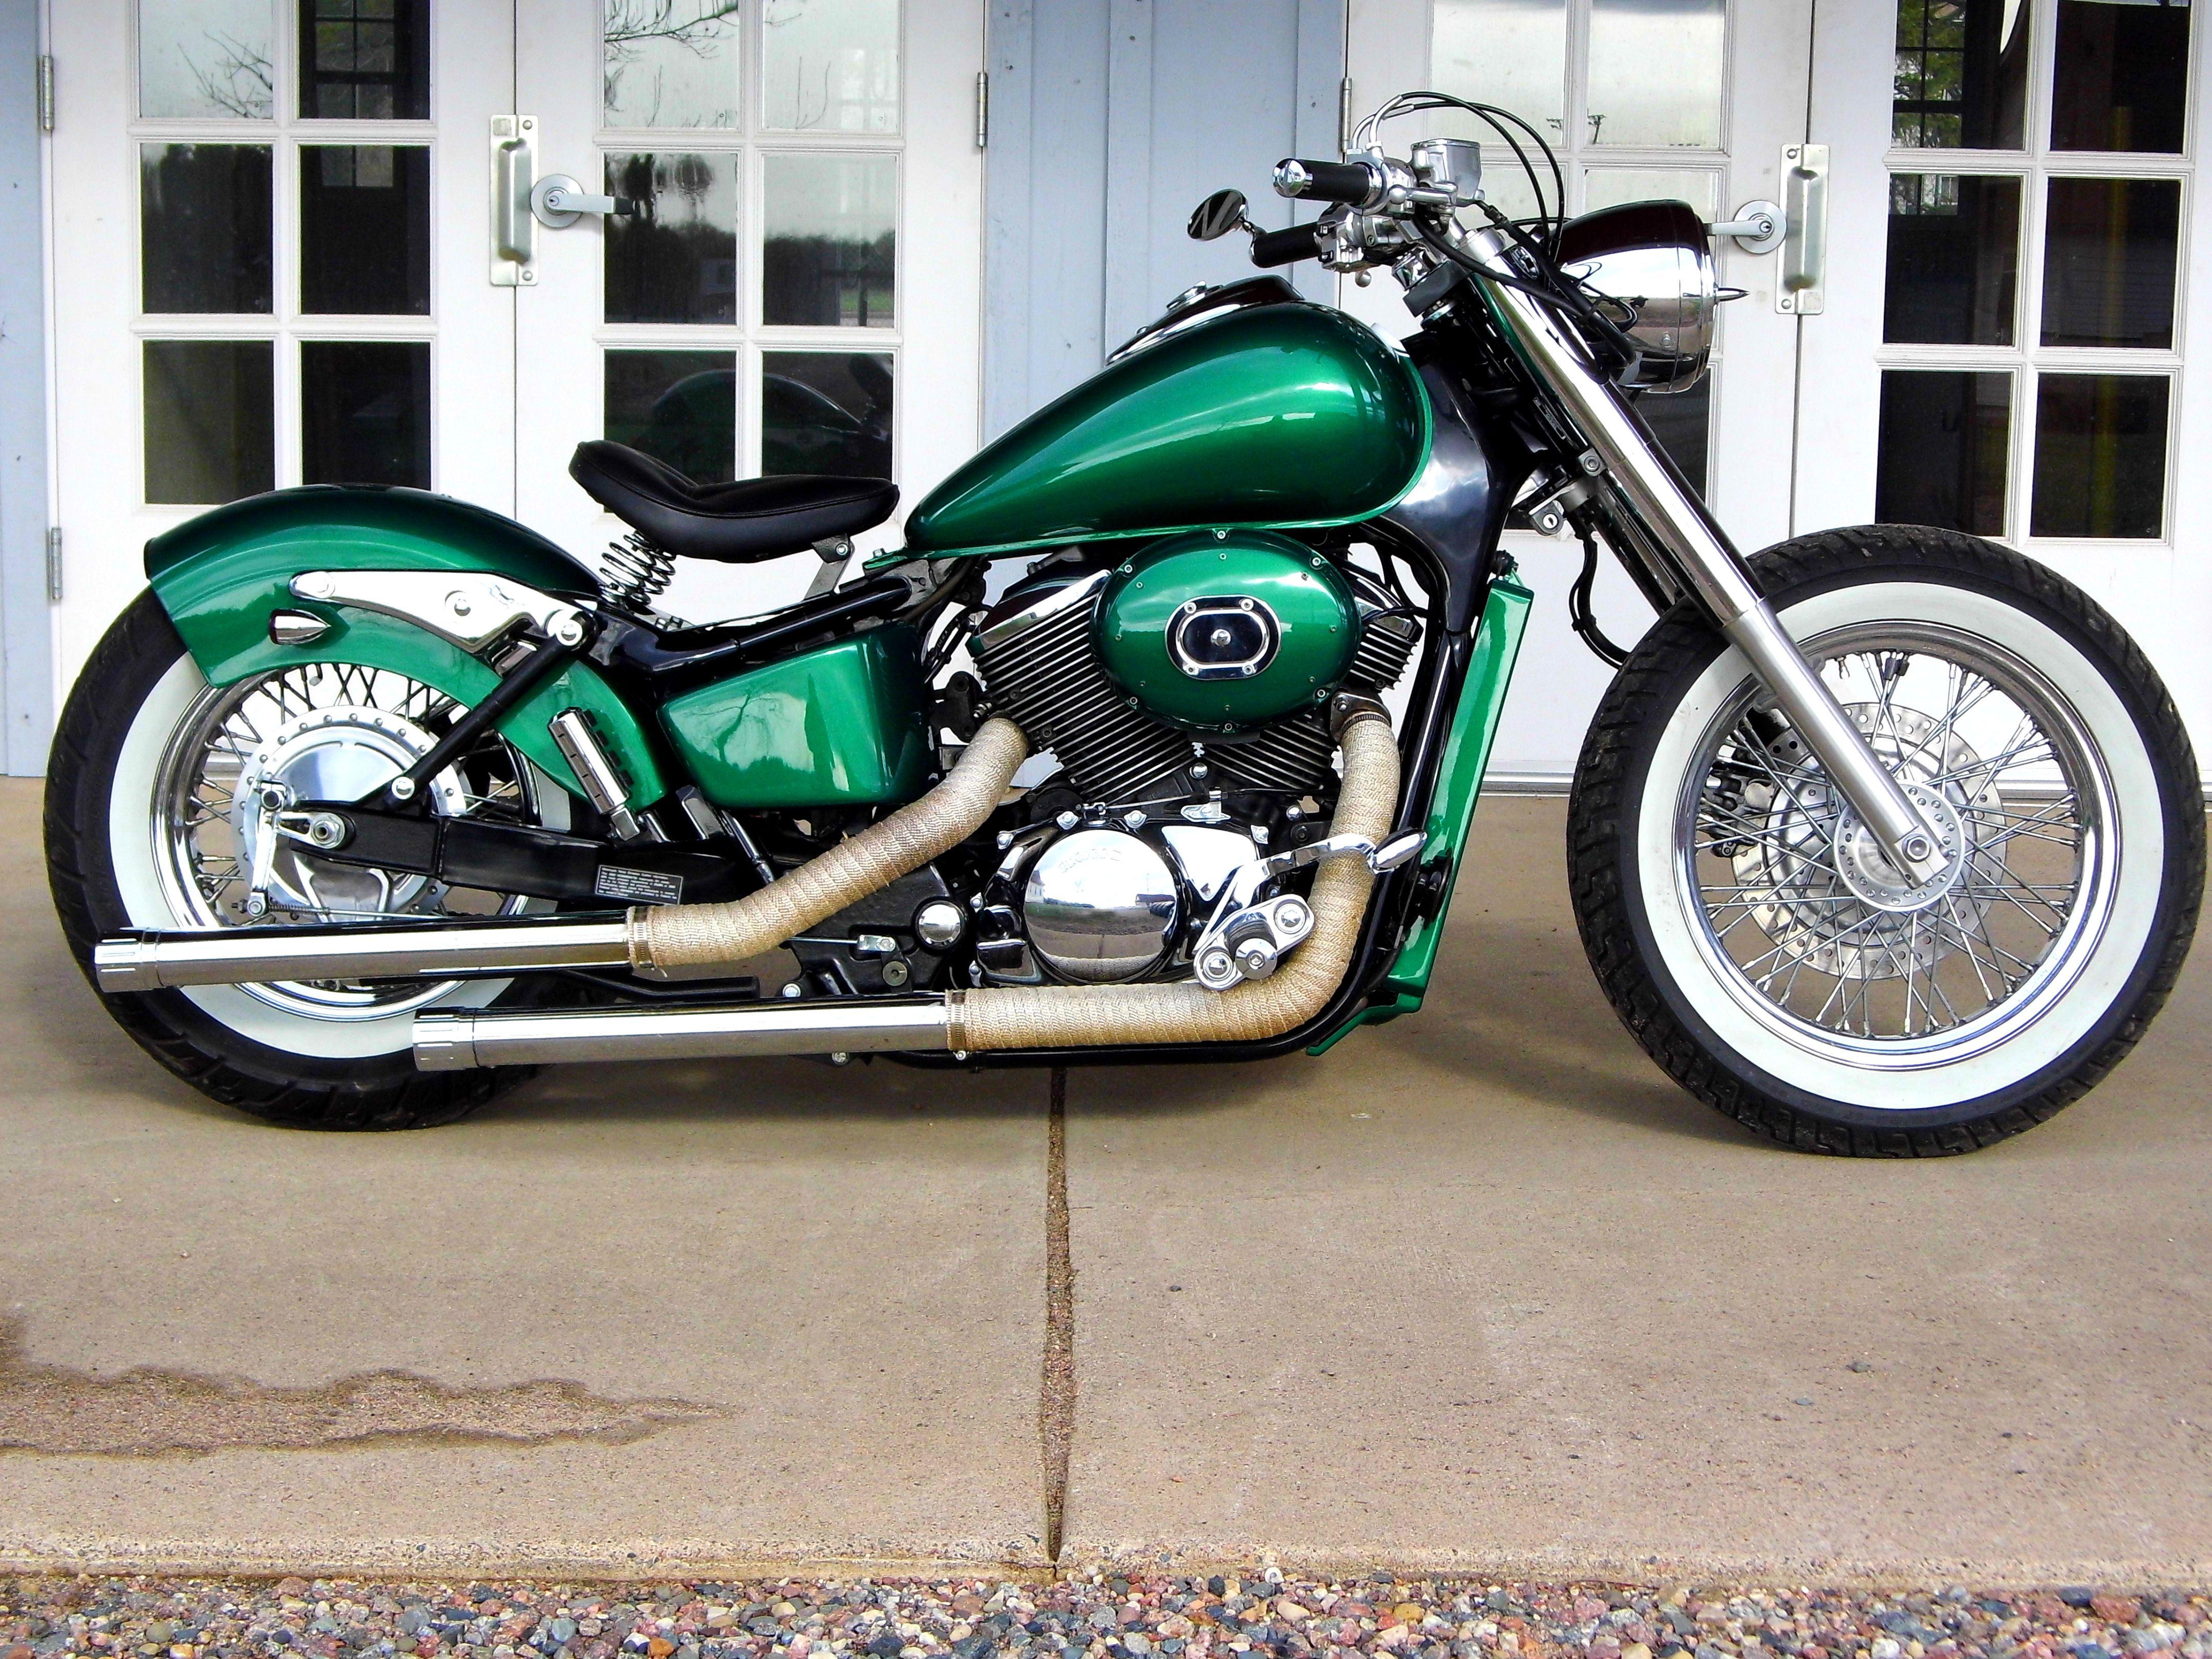 Idea For My Shadow Honda Shadow Ace Bobber My Bike Honda